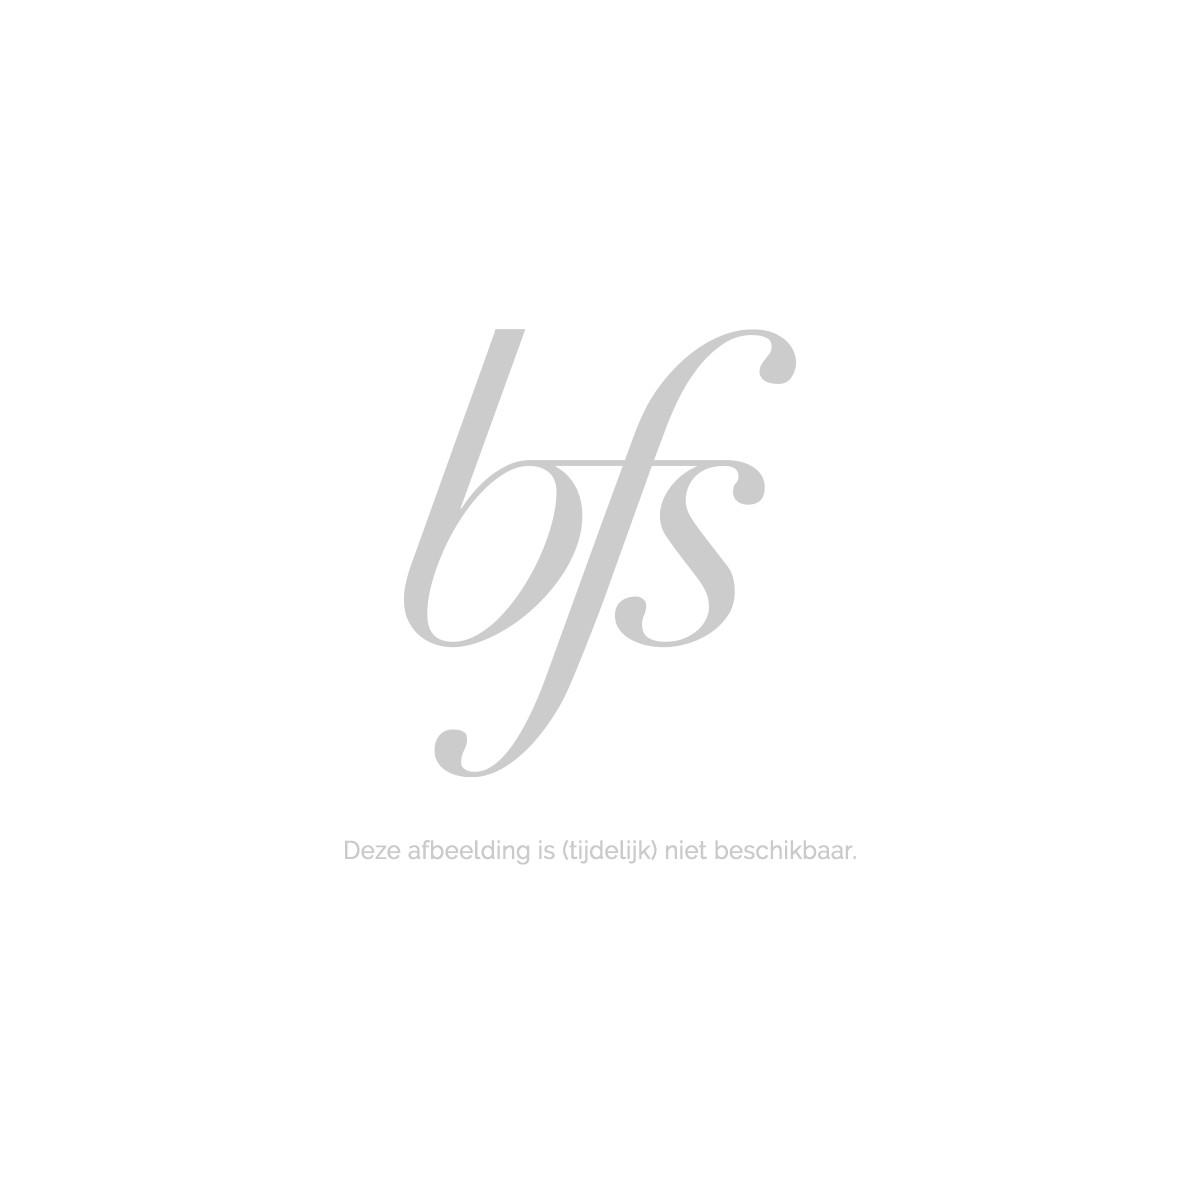 Christian Dior Capture Totale Nutrition Serum Oil 30 Ml